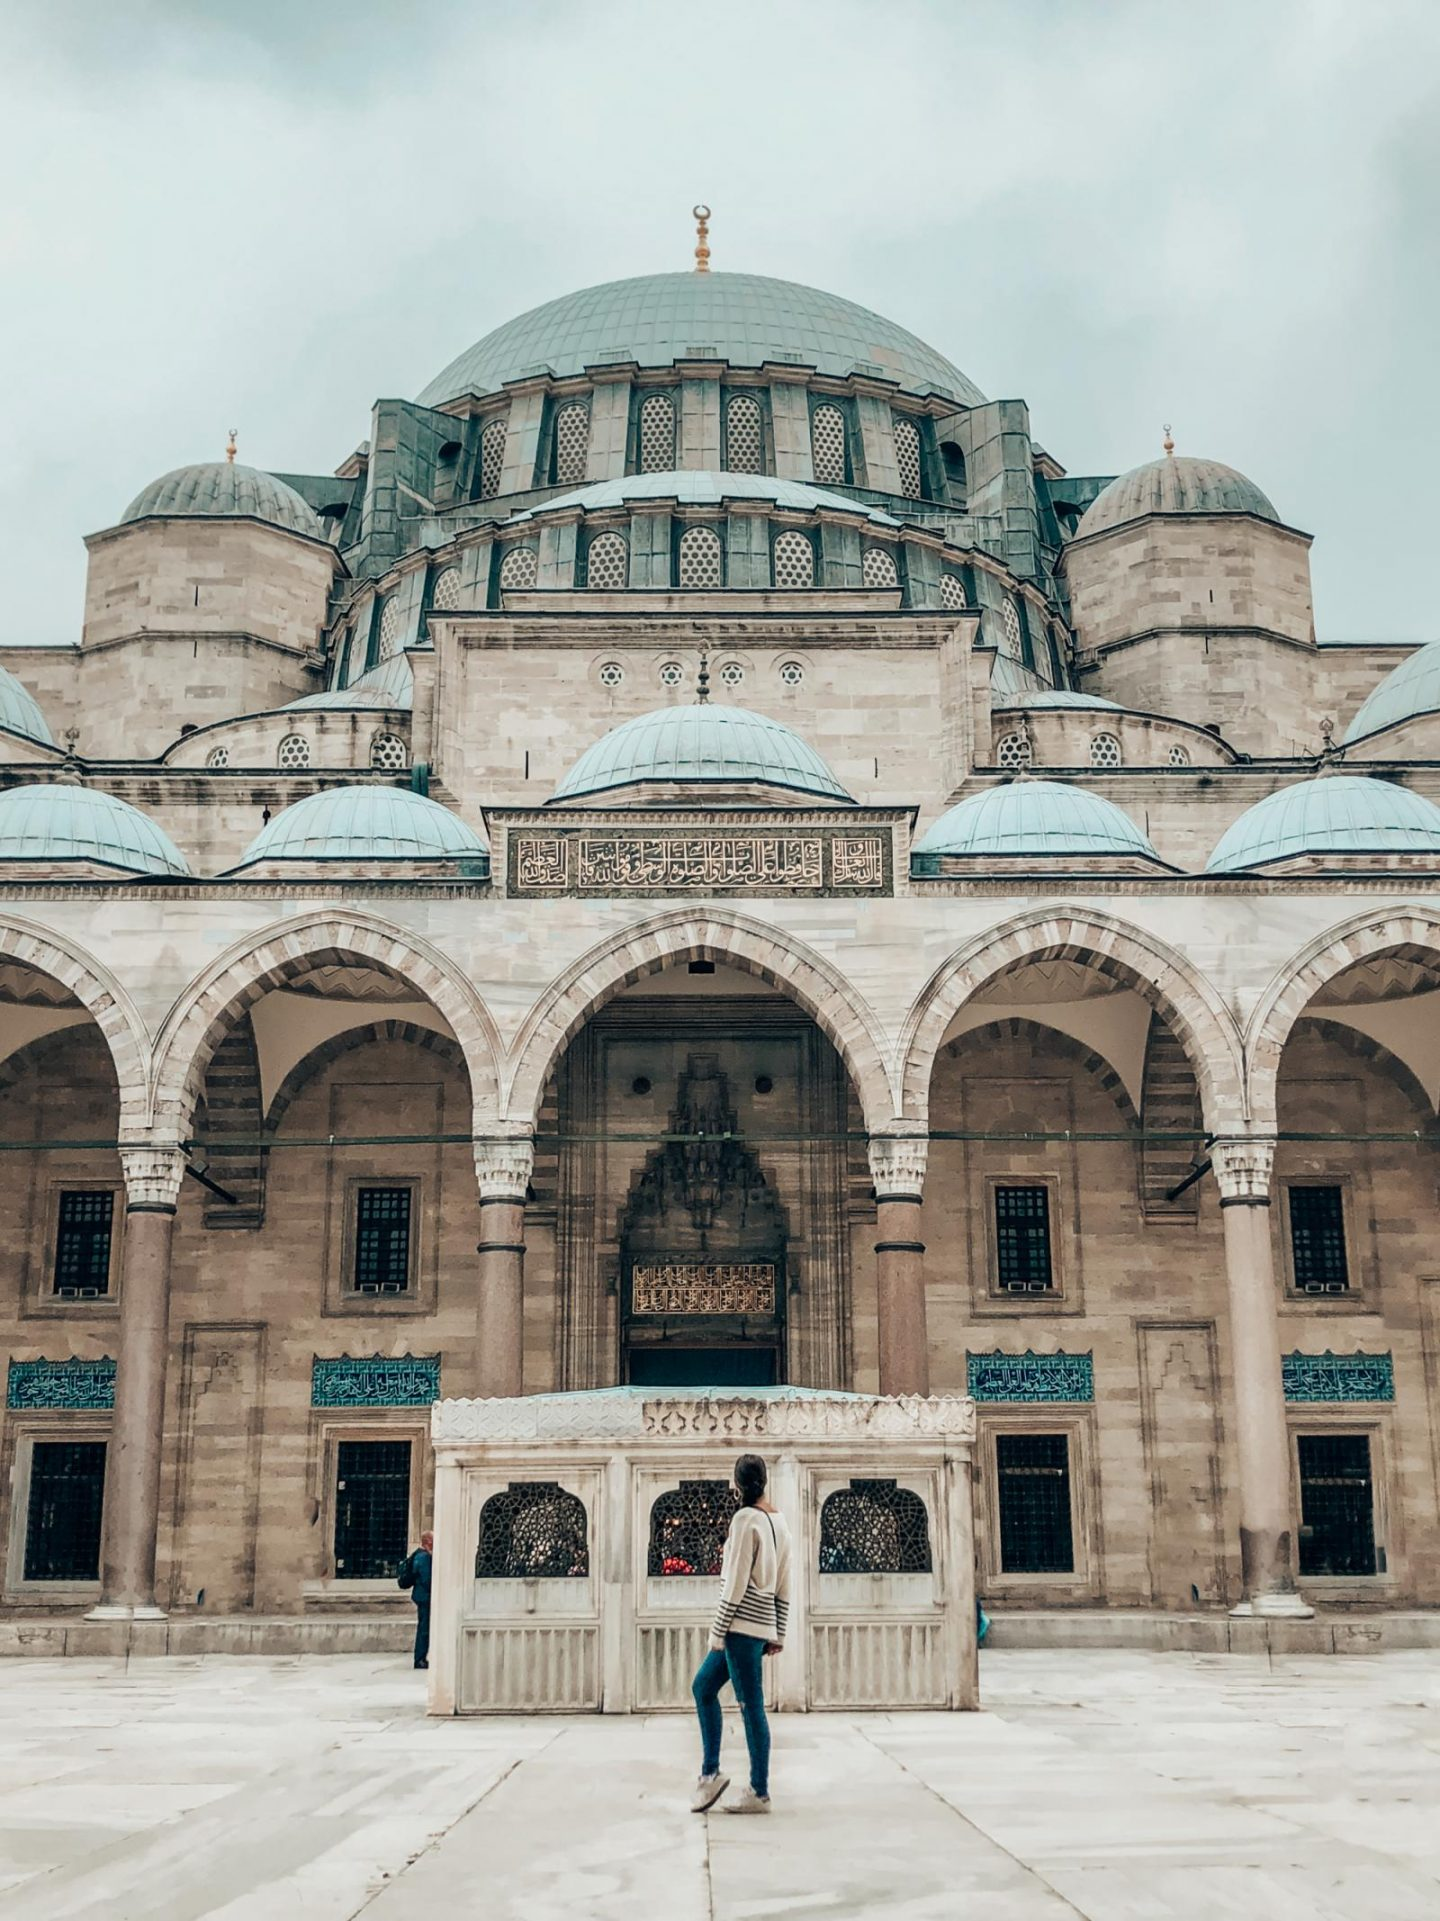 Istanbul itinerary - 3 days in Istanbul Suleymaniye Mosque